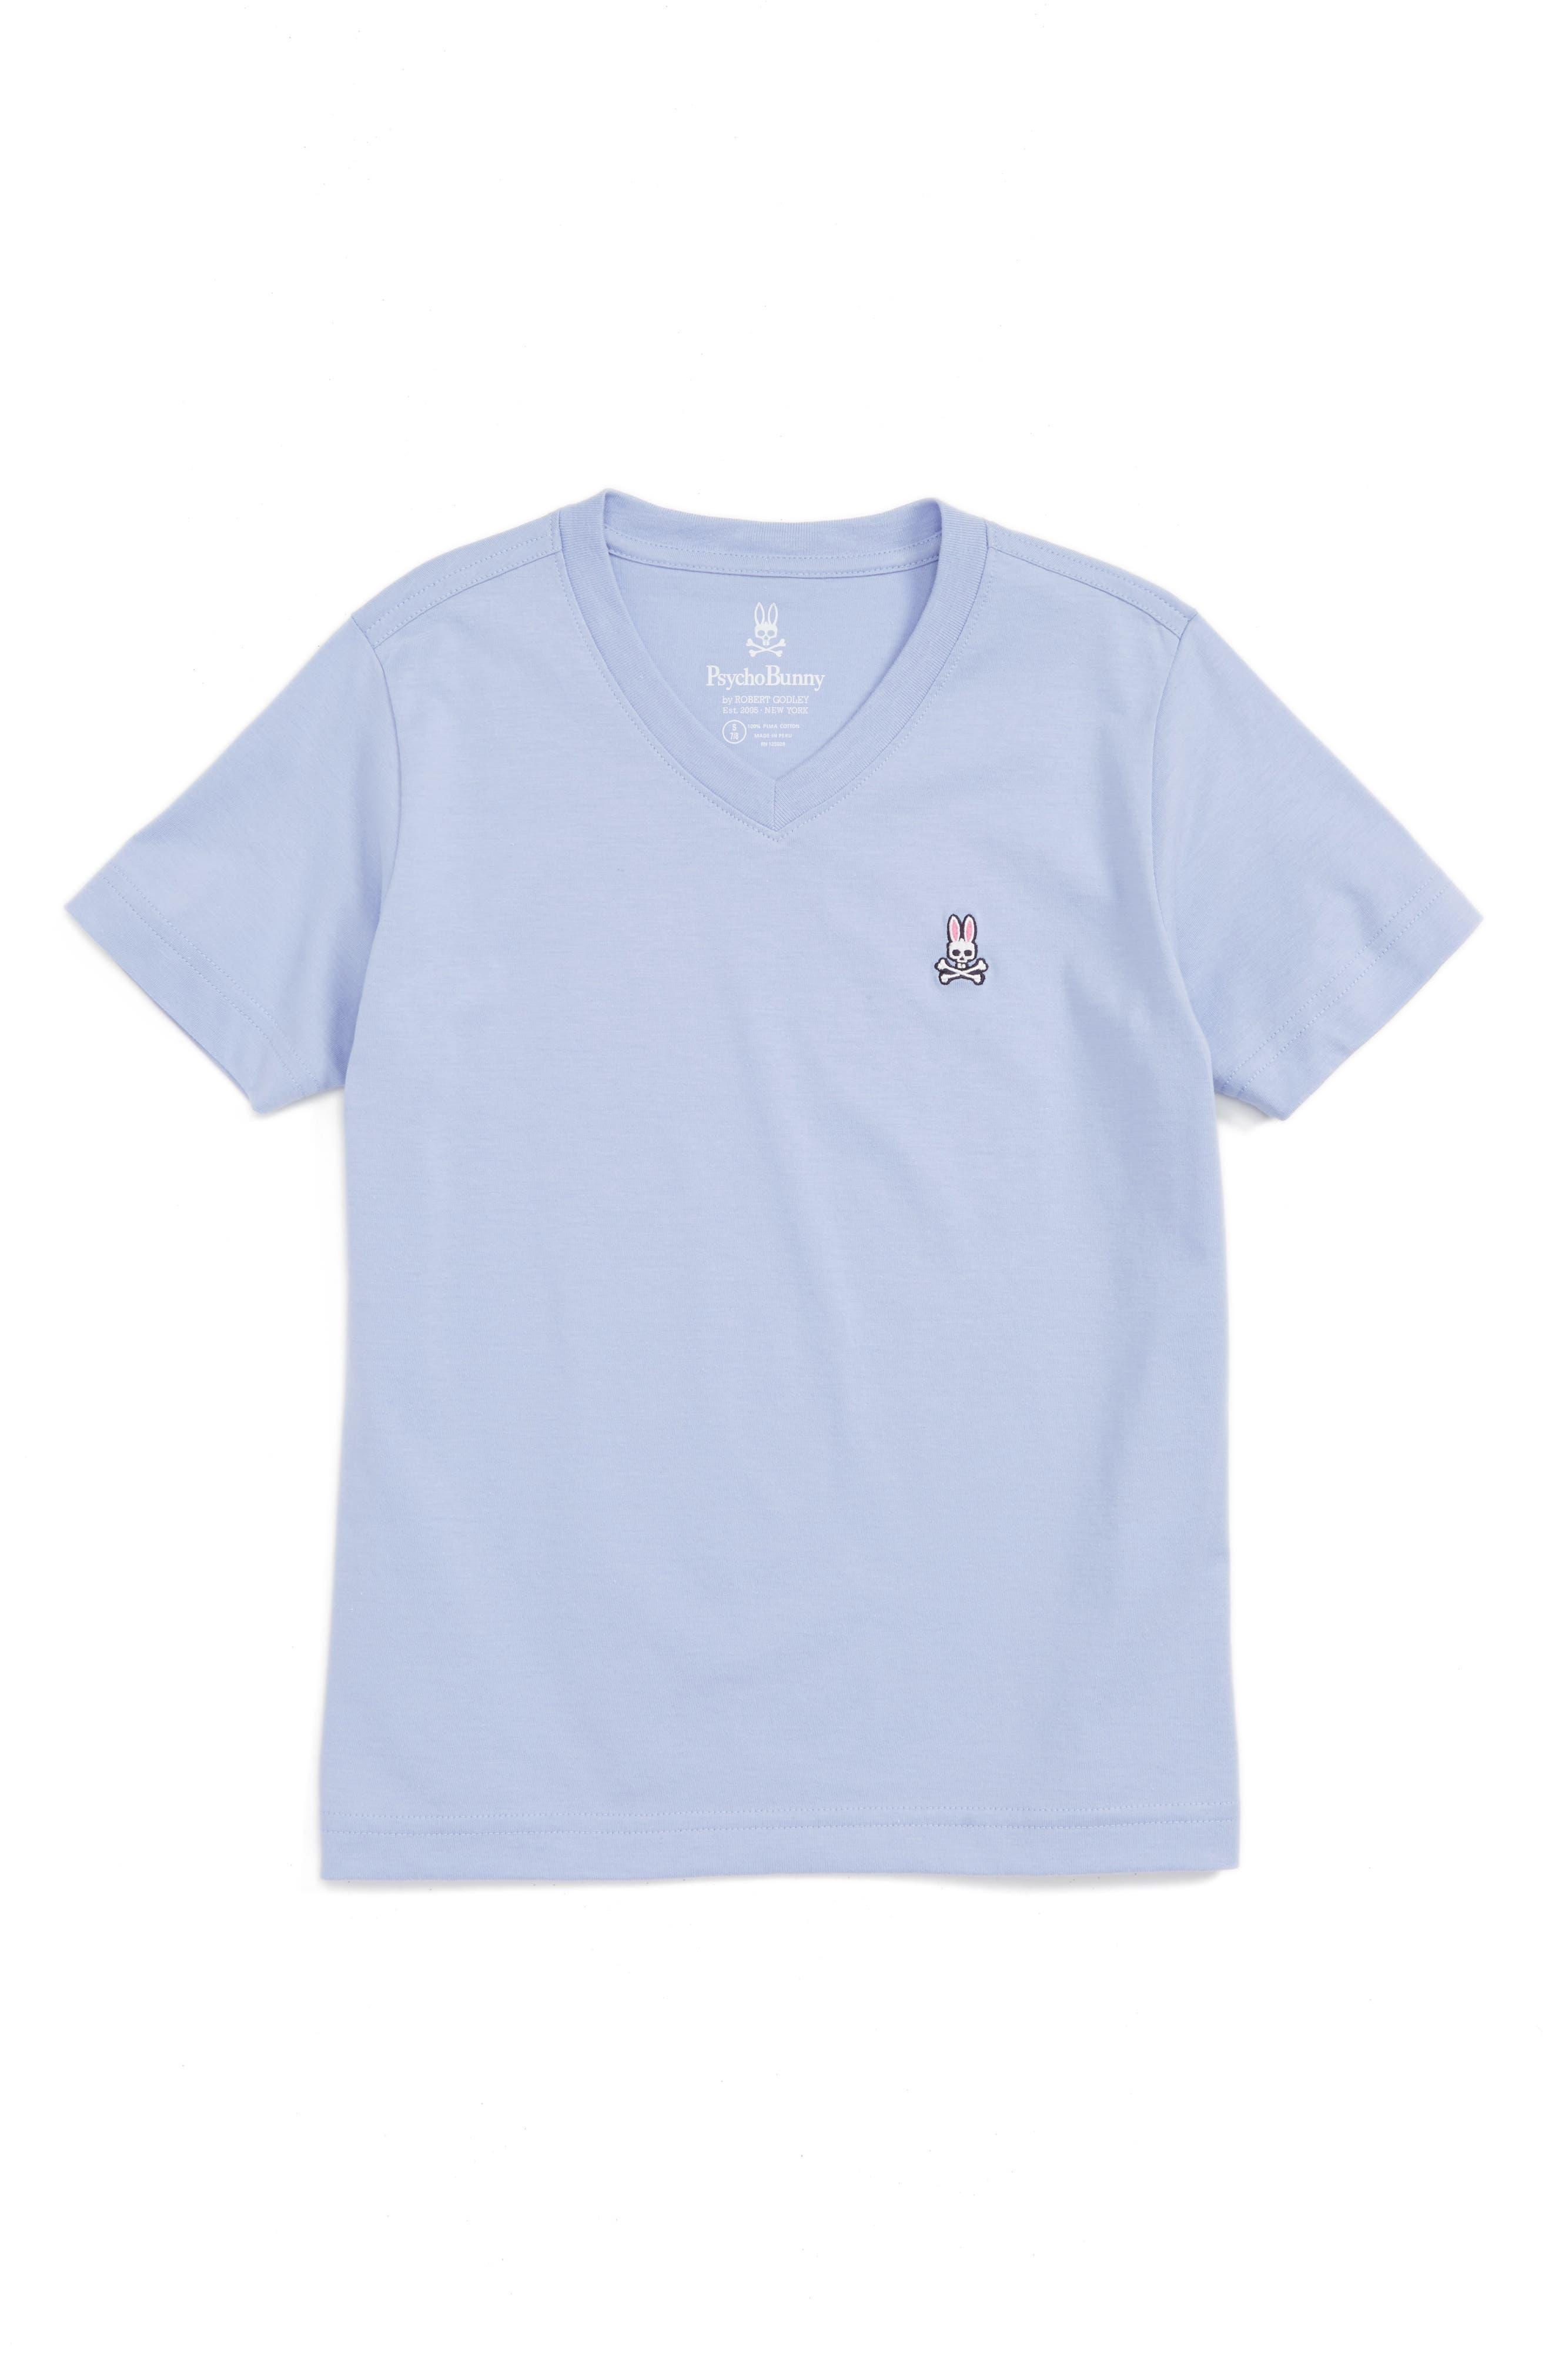 Alternate Image 1 Selected - Psycho Bunny V-Neck T-Shirt (Little Boys & Big Boys)